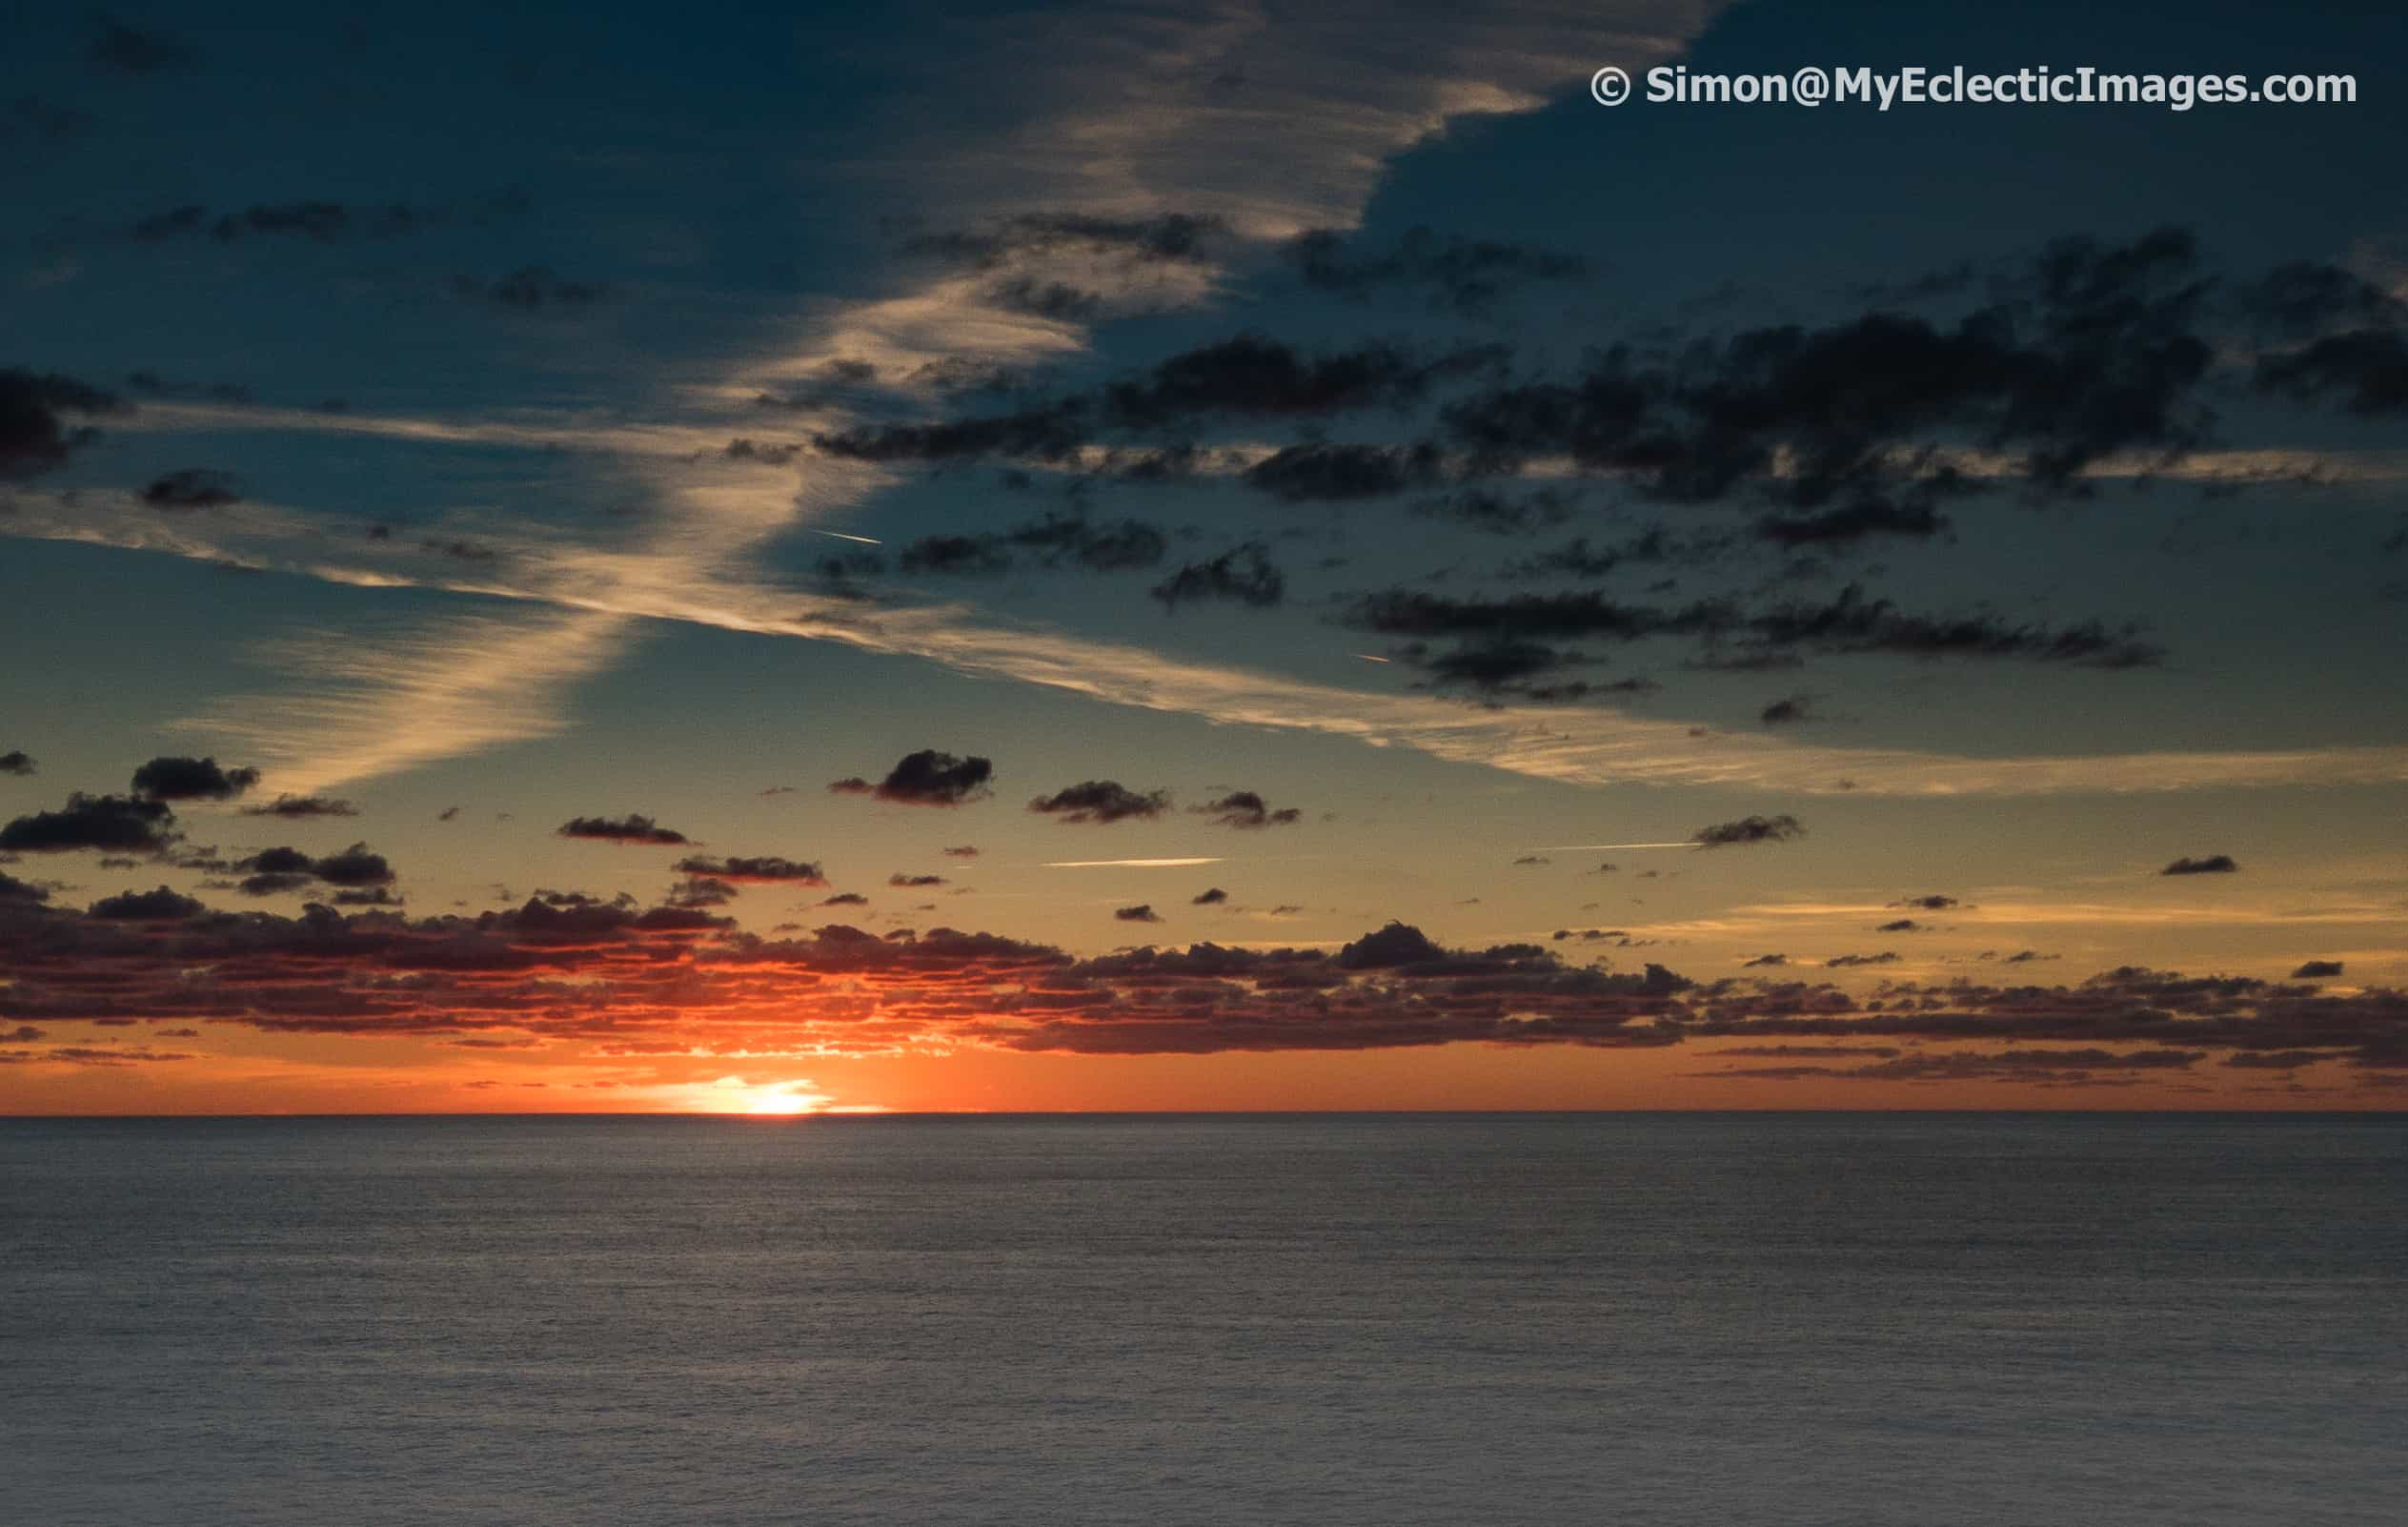 Nieuw Statendam Mid-Atlantic Calm Seas and Beautiful Sunset on a Repositioning Cruise